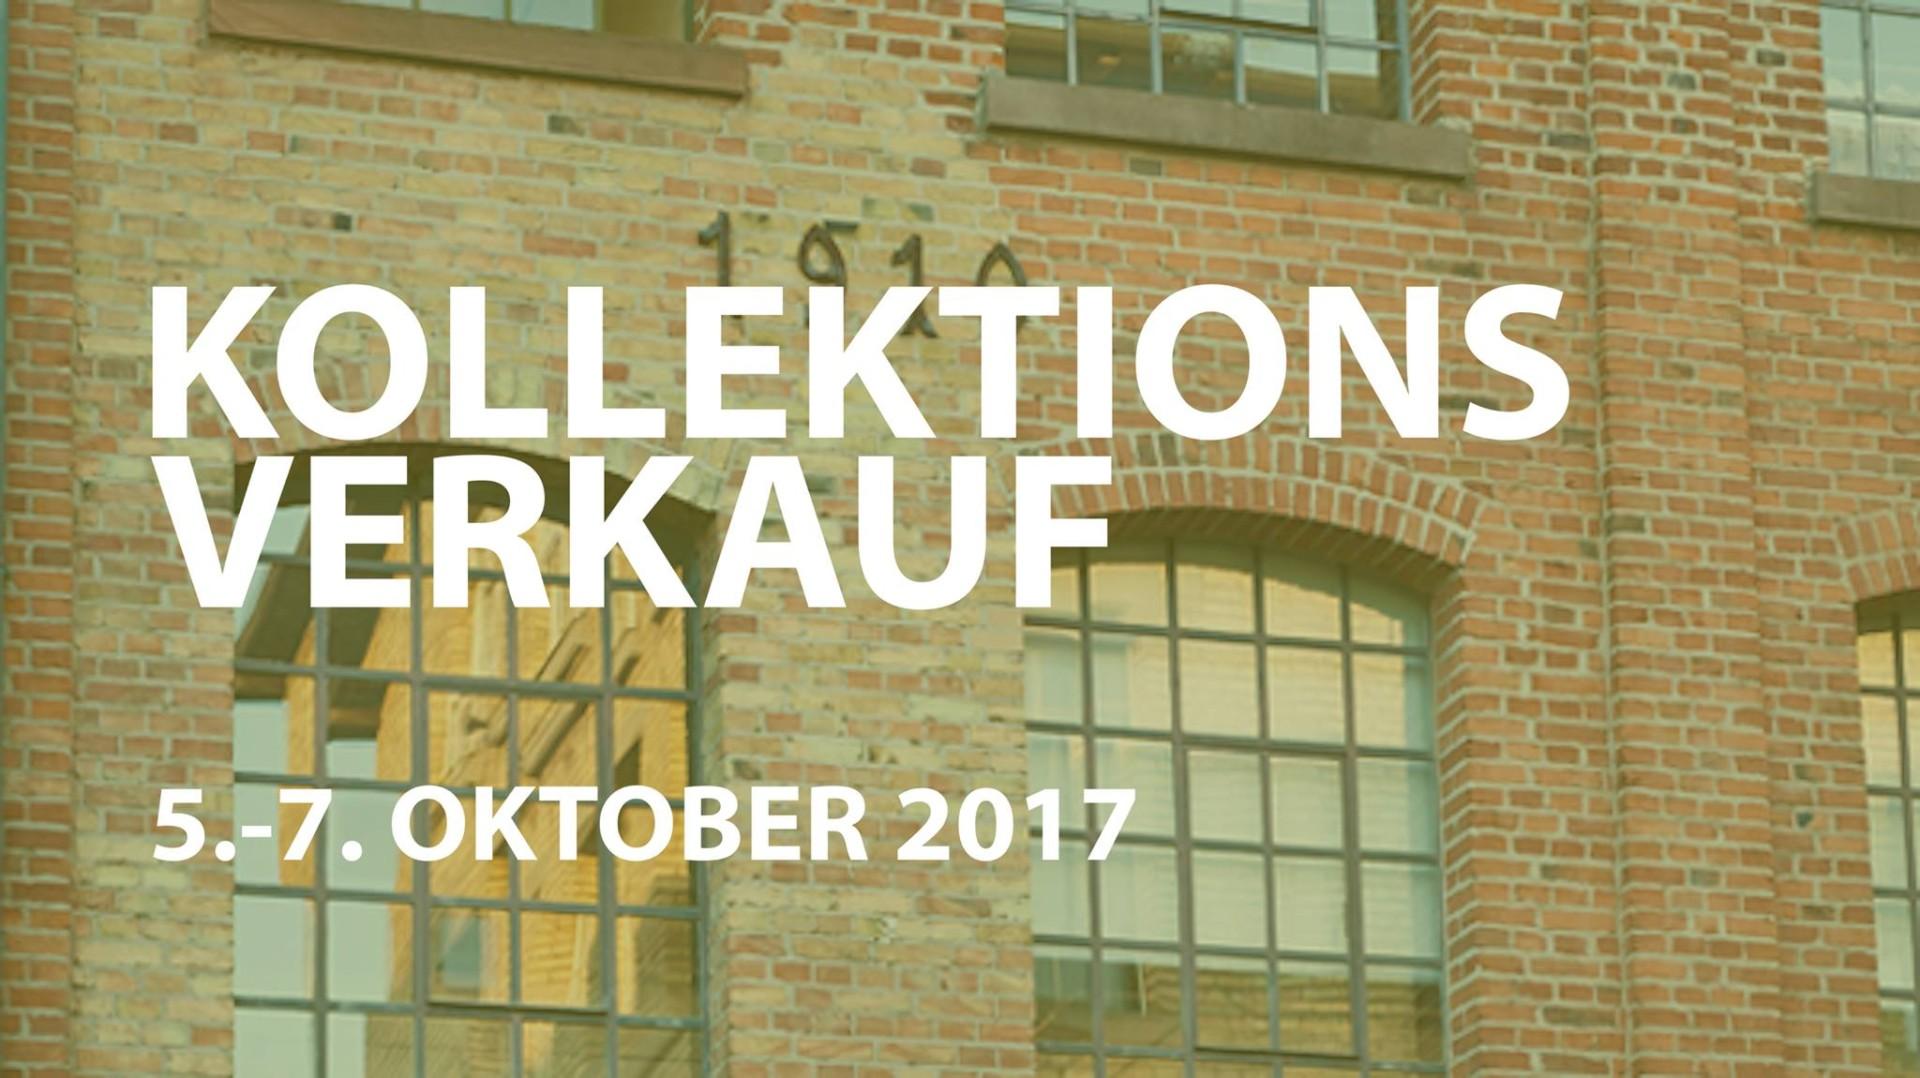 06.10.2017 - Kollektionsverkauf, Heyne Fabrik, Offenbach